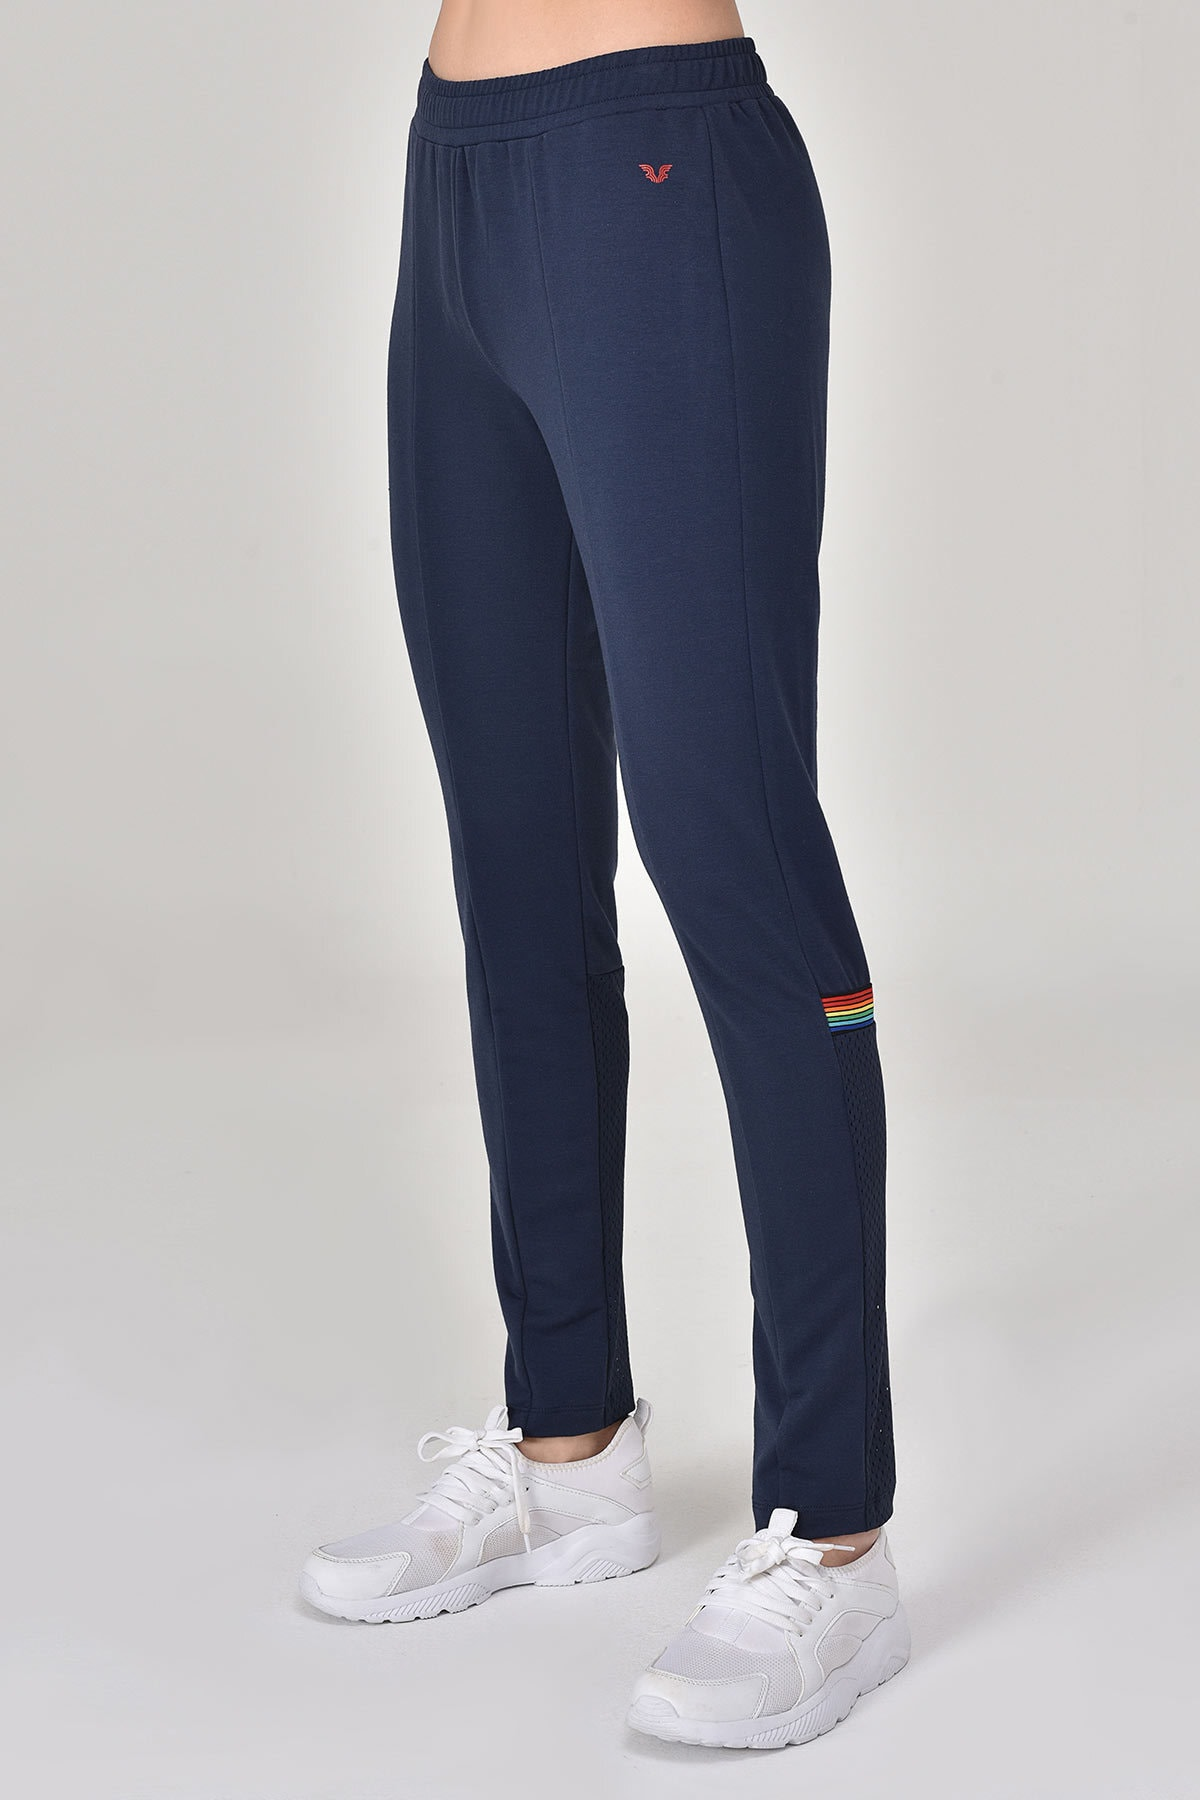 bilcee Lacivert Kadın Pantolon  GS-8095 1